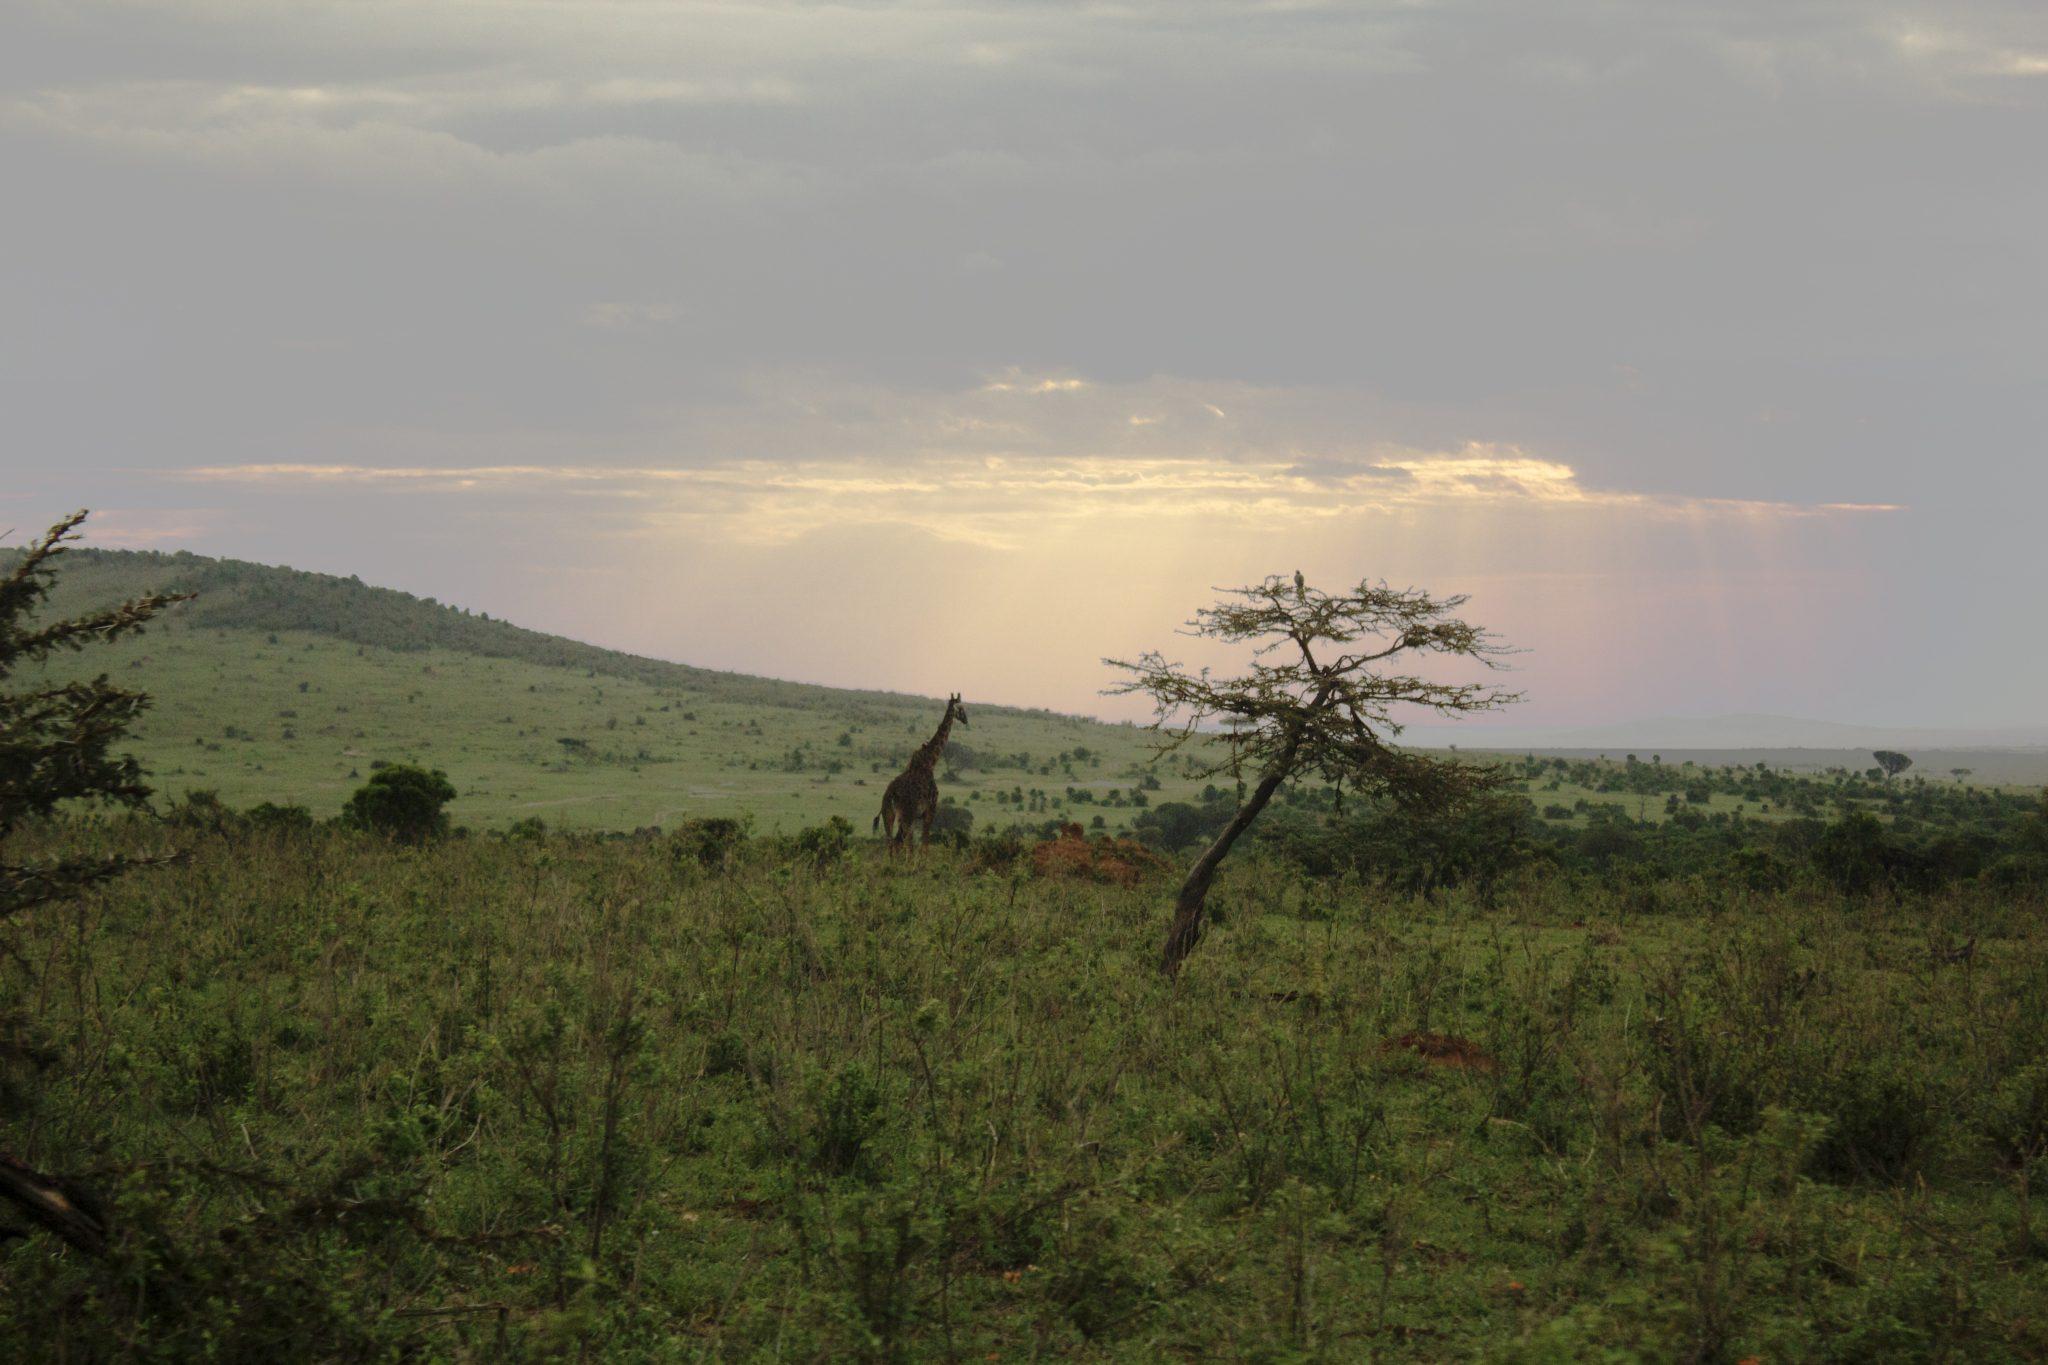 Maasai Maran kansallispuisto, Maasai mara Kenia, Maasai mara national reserve, maasai mara national reserve kenya